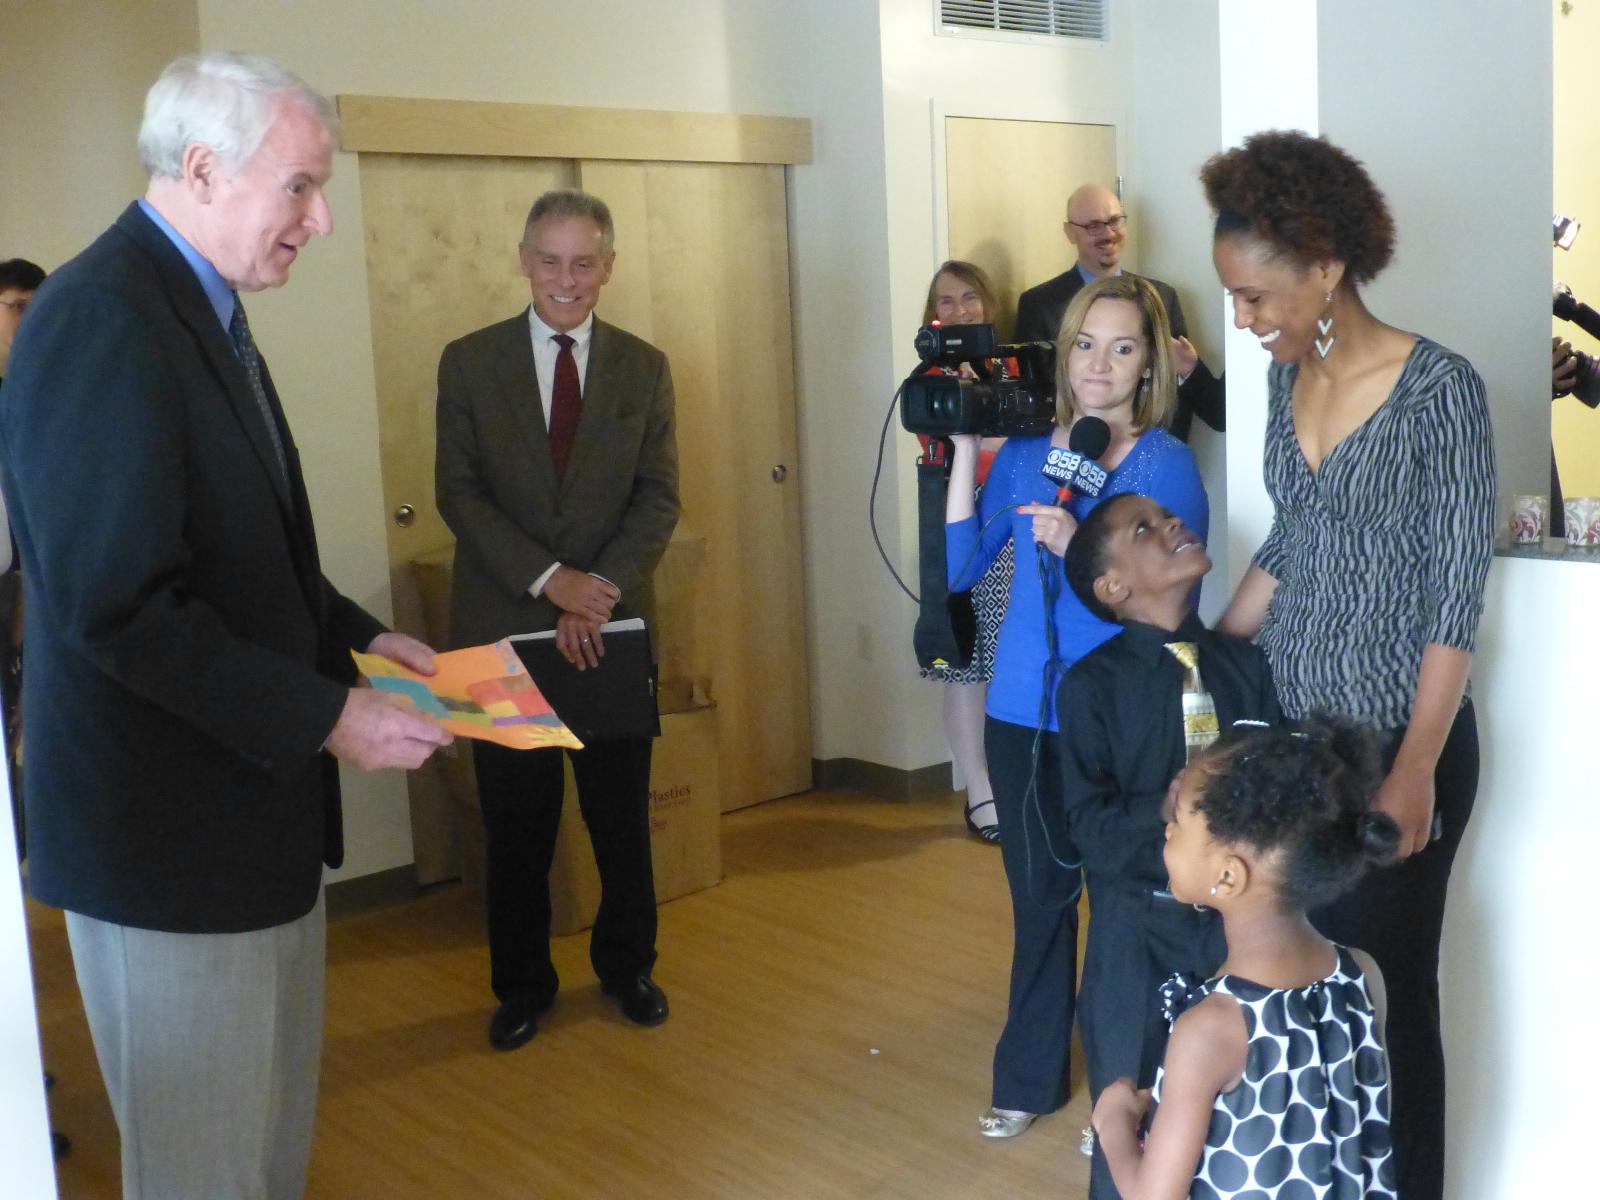 Meeting the mayor.